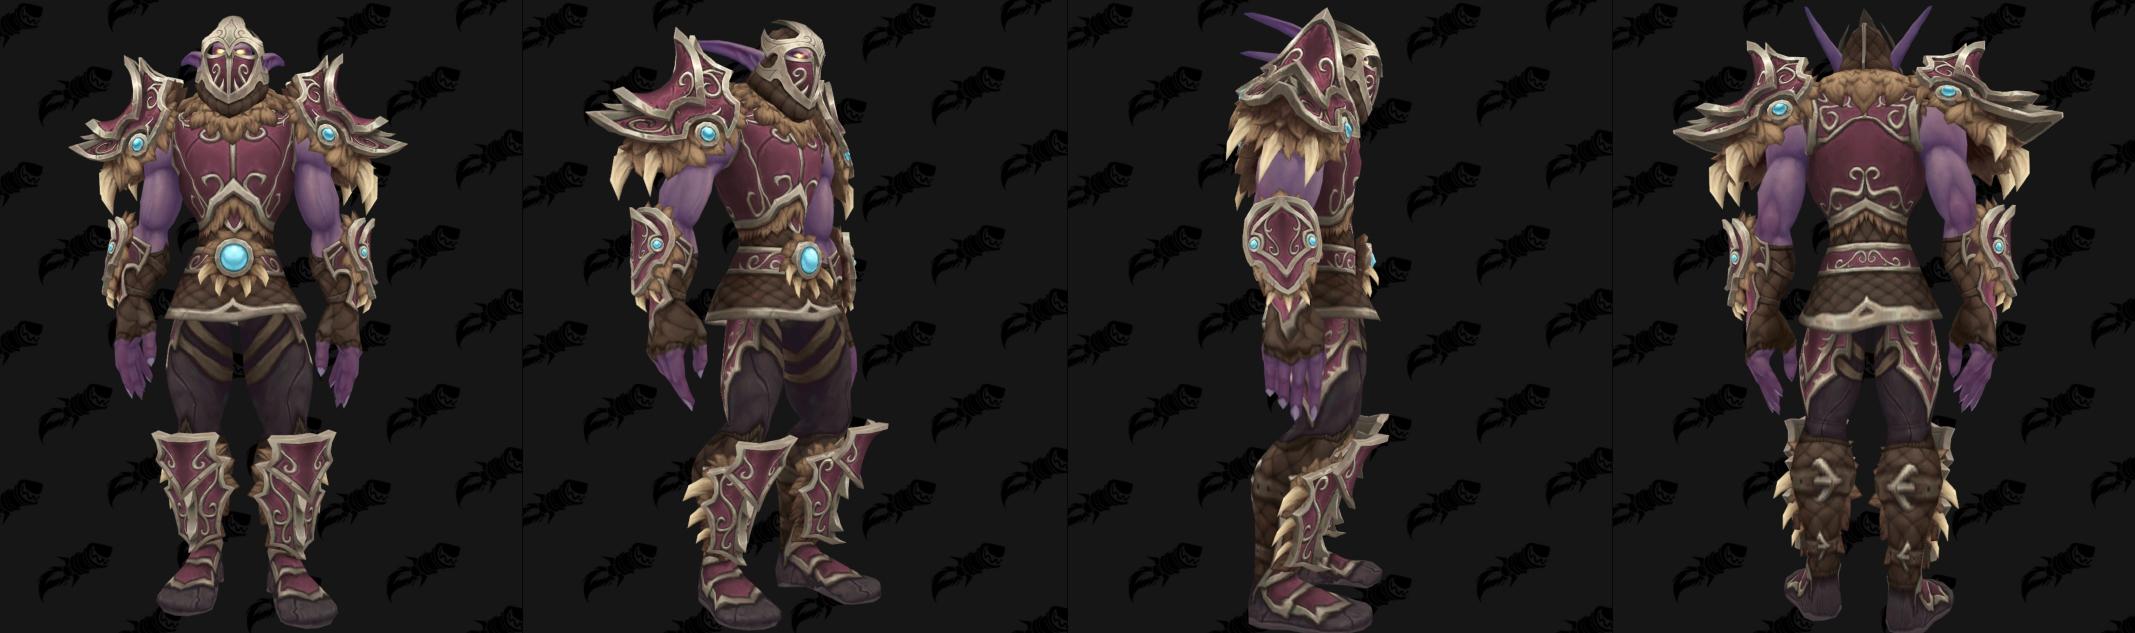 Armure Cuir Alliance - Front de guerre Sombrivage Tier 2